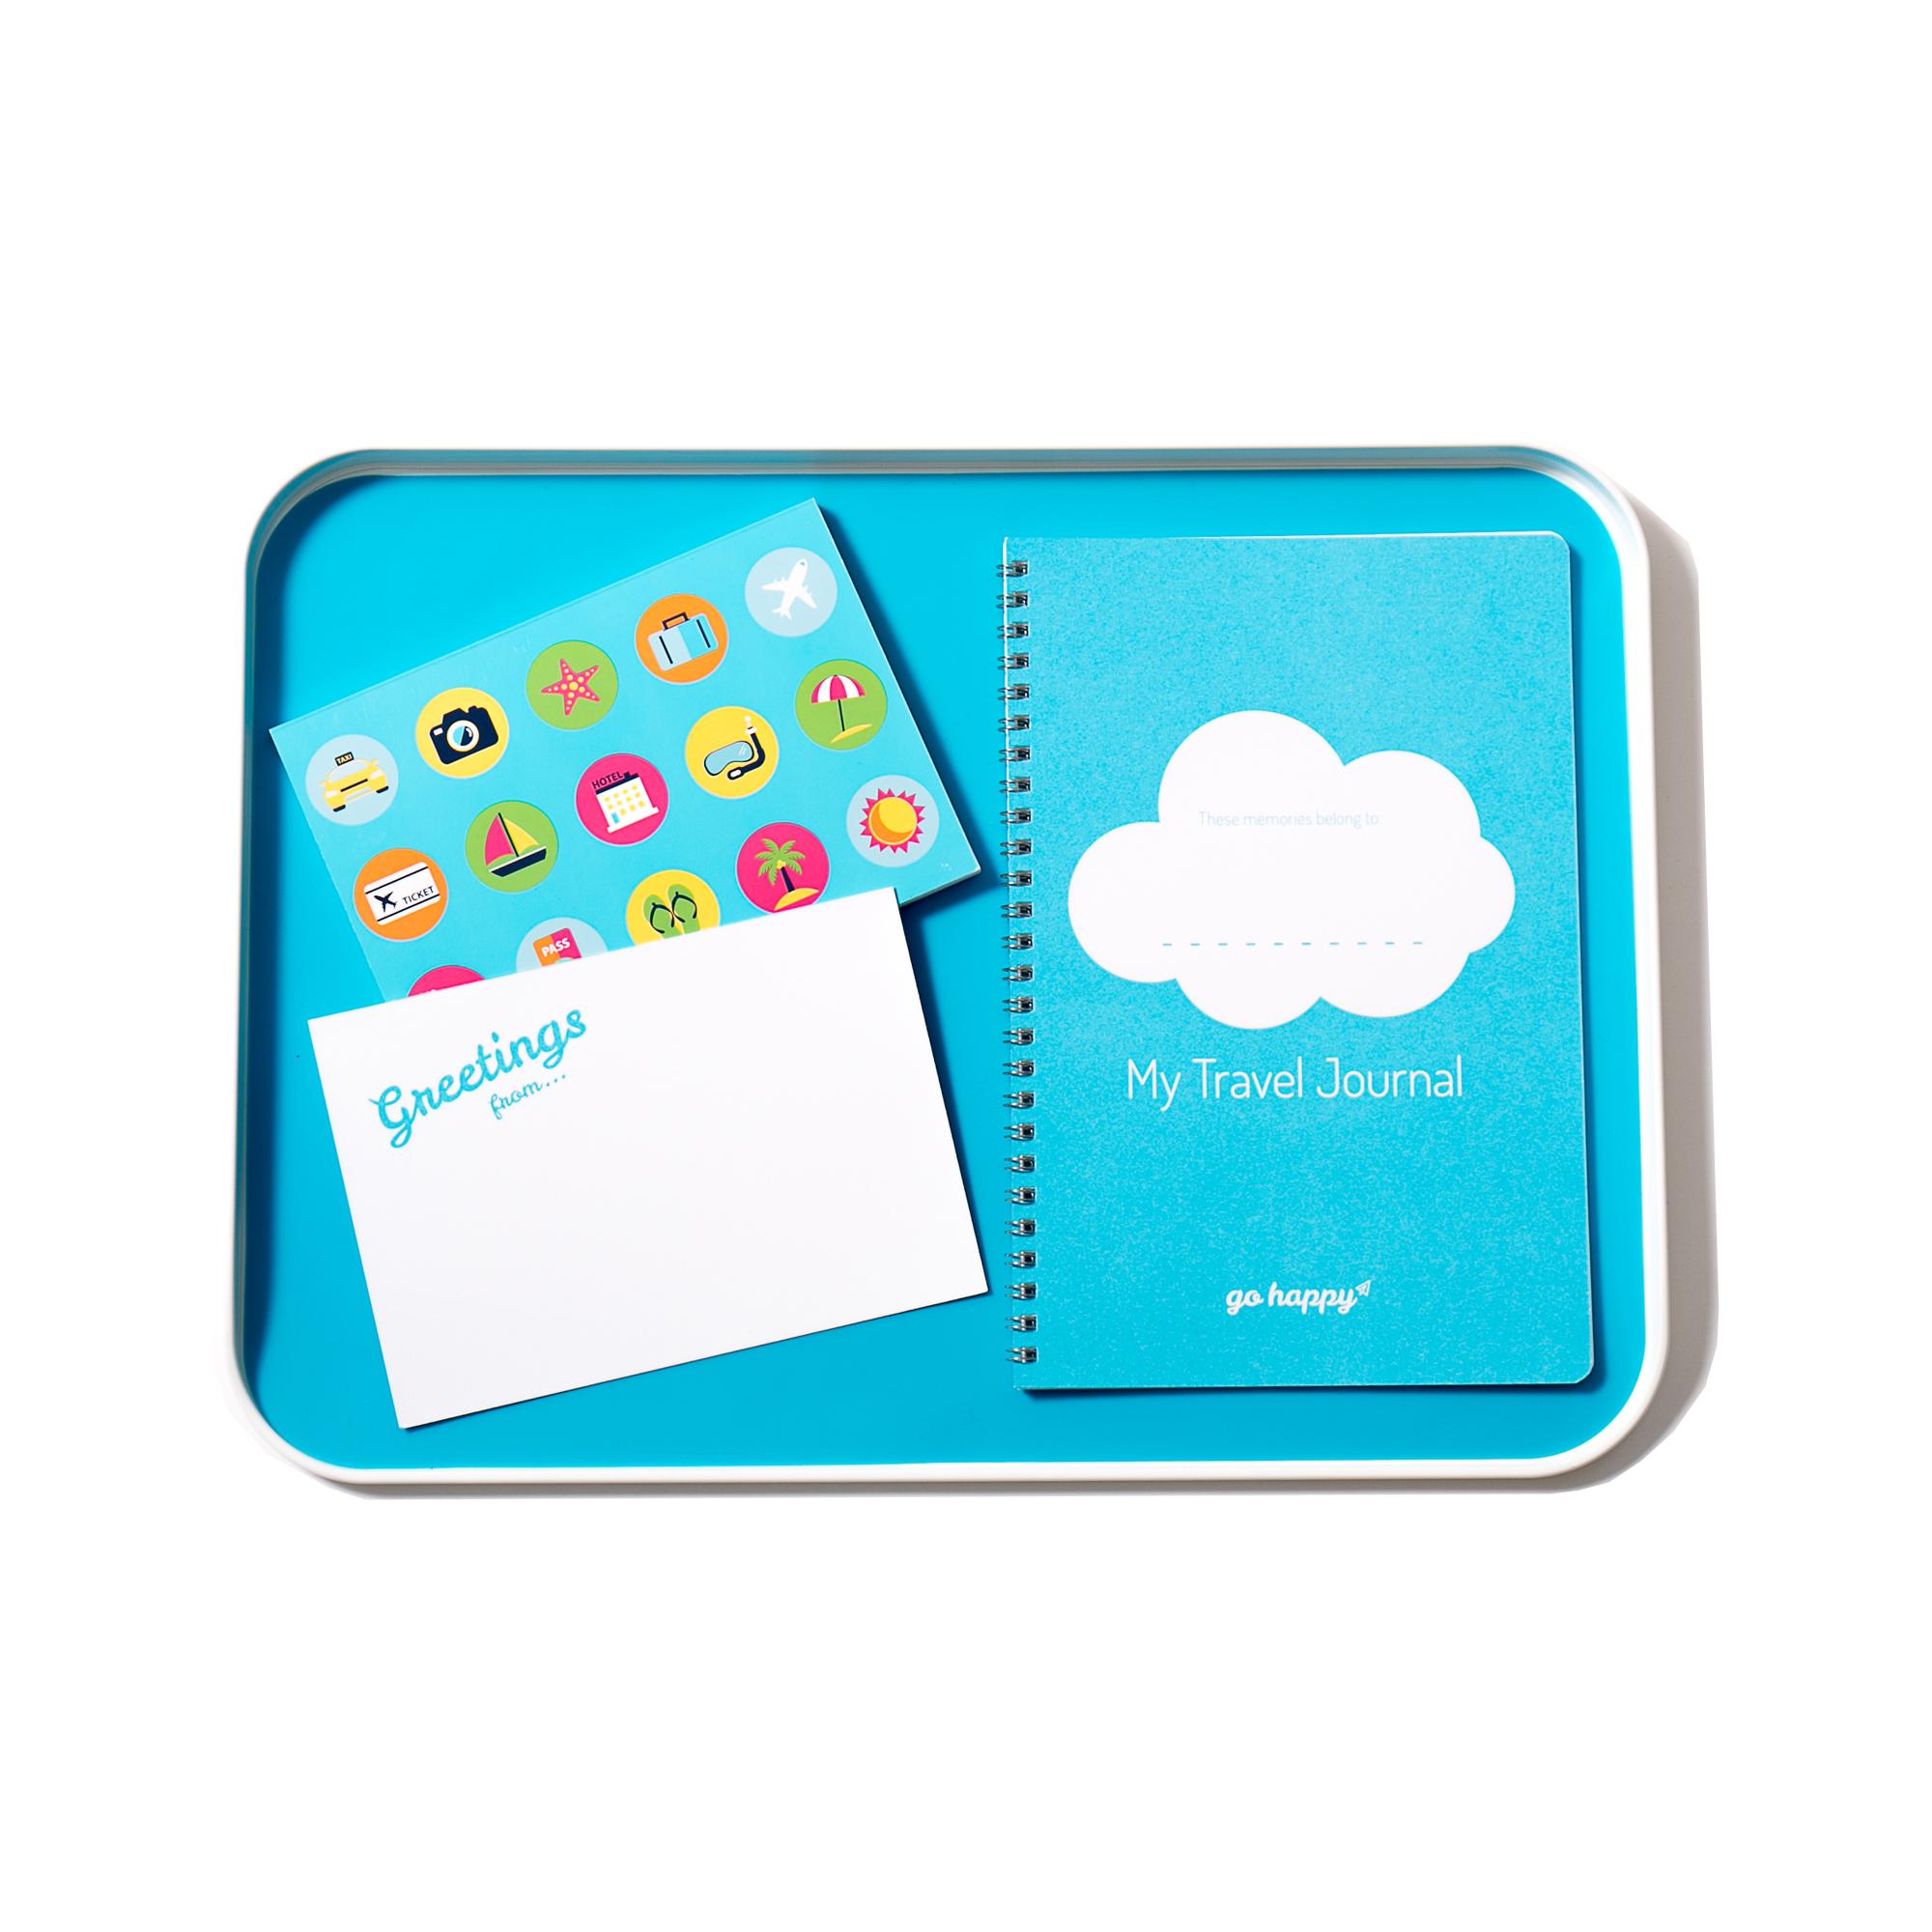 GoHappy_Amazon_SoftGoods_tray&travelbook&postcard (1).jpg